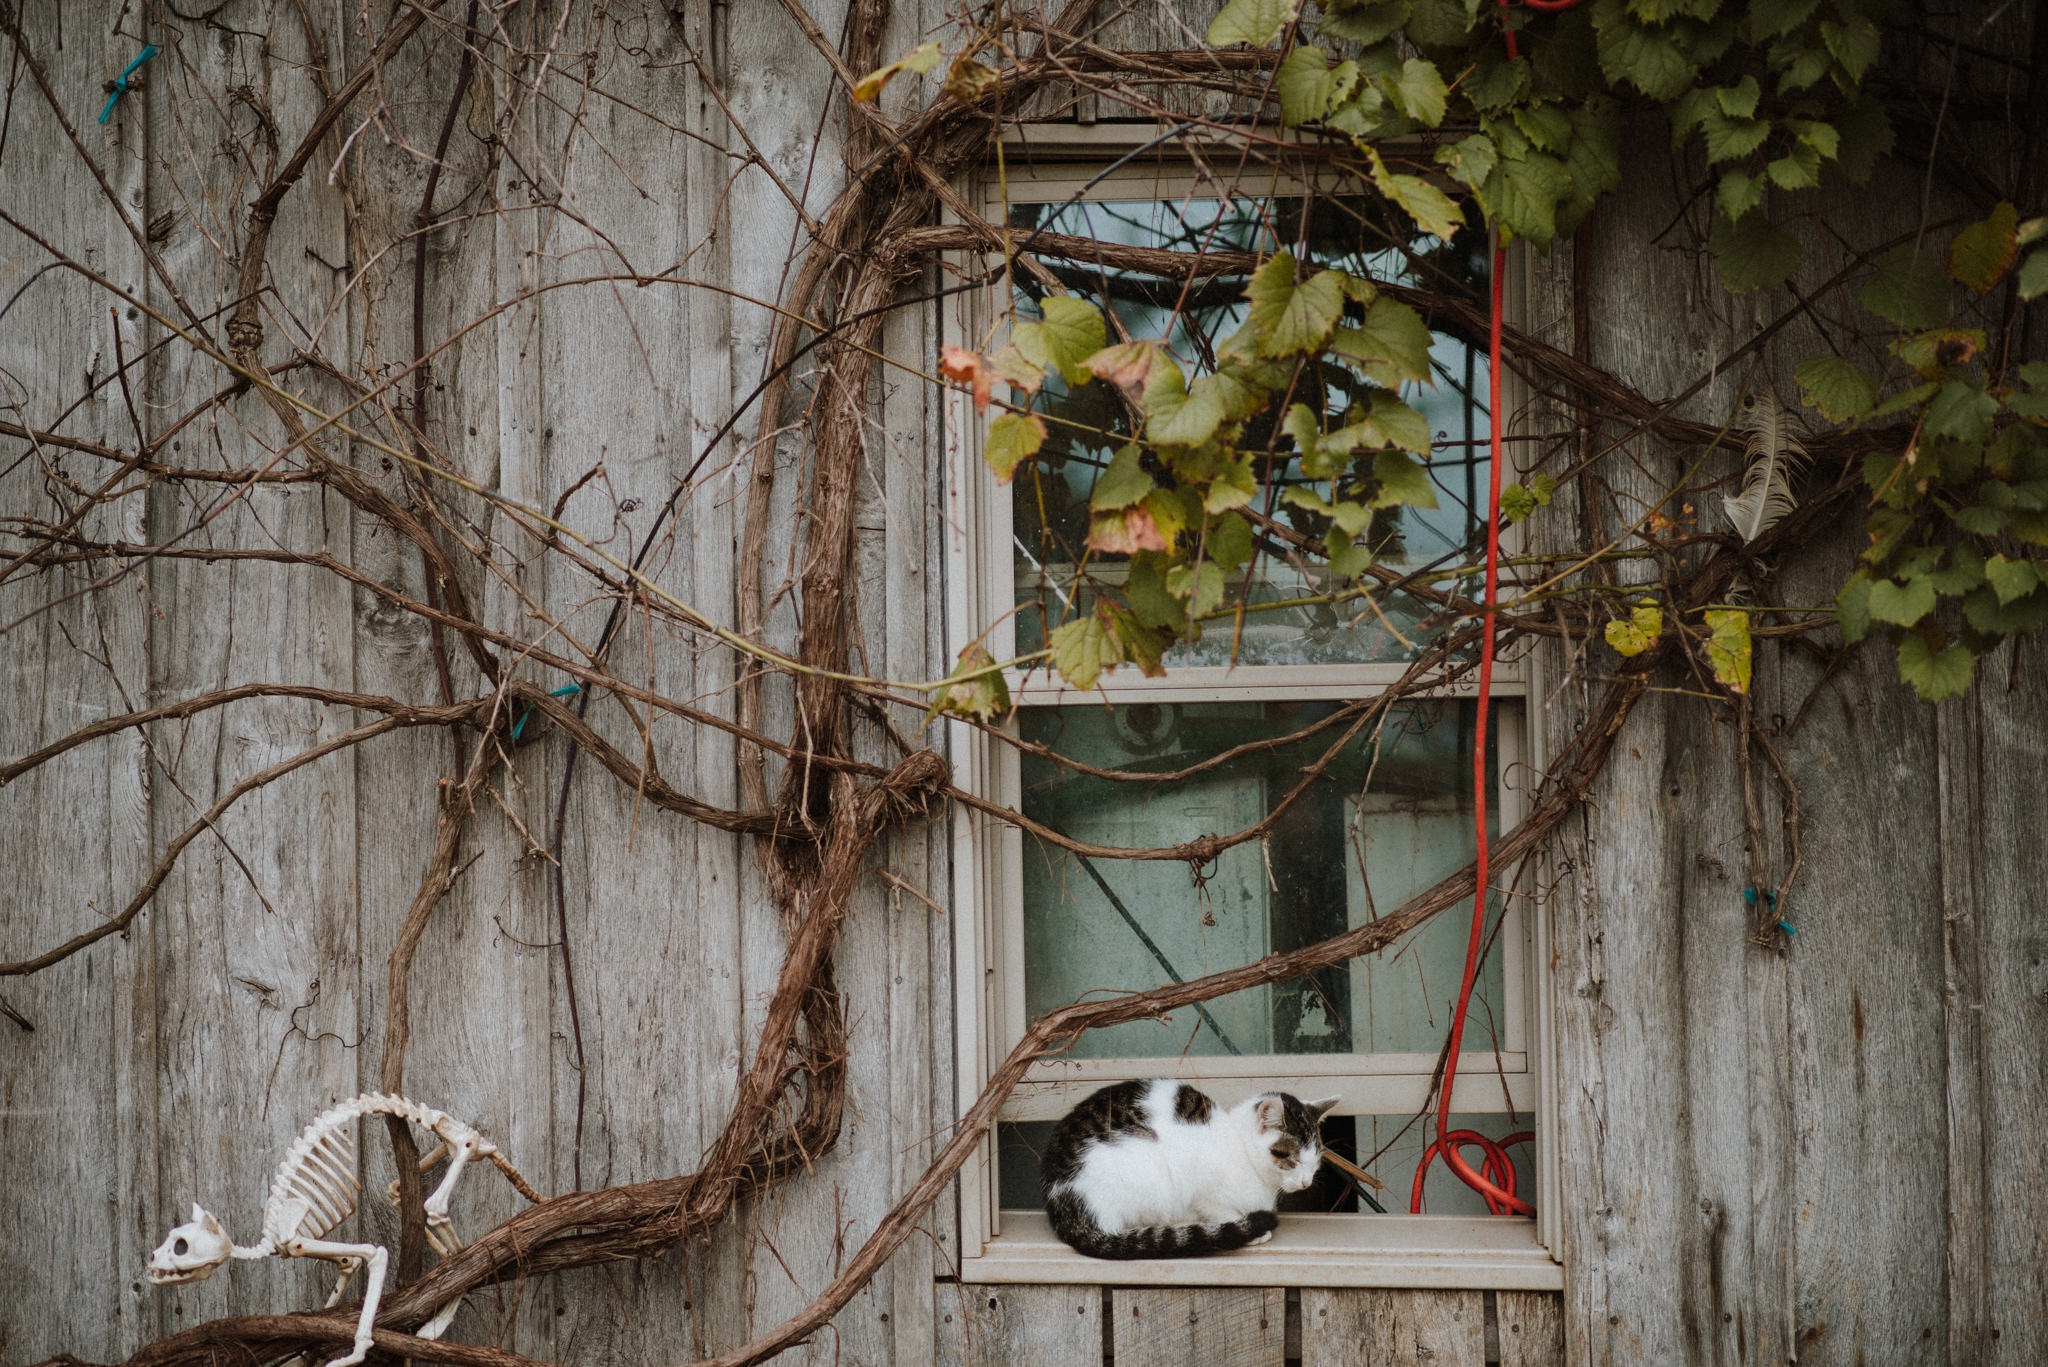 ApkePhotography_Tricia+Mike_WestVirginiaWedding_Farm_77.jpg